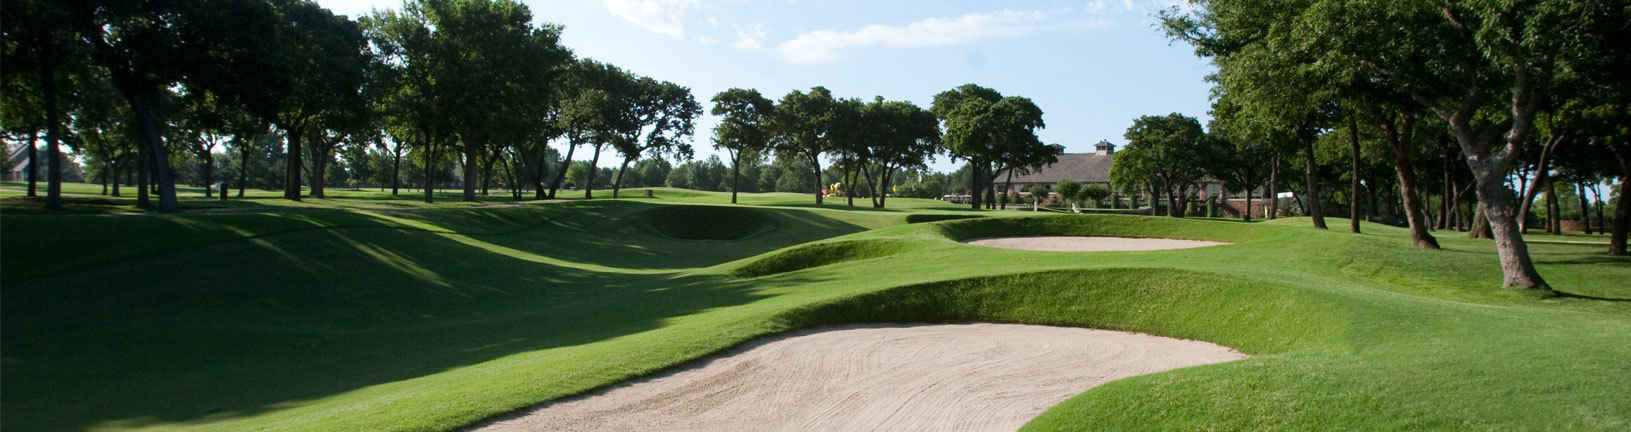 2020 Stan Deardeuff Memorial Golf Classic image